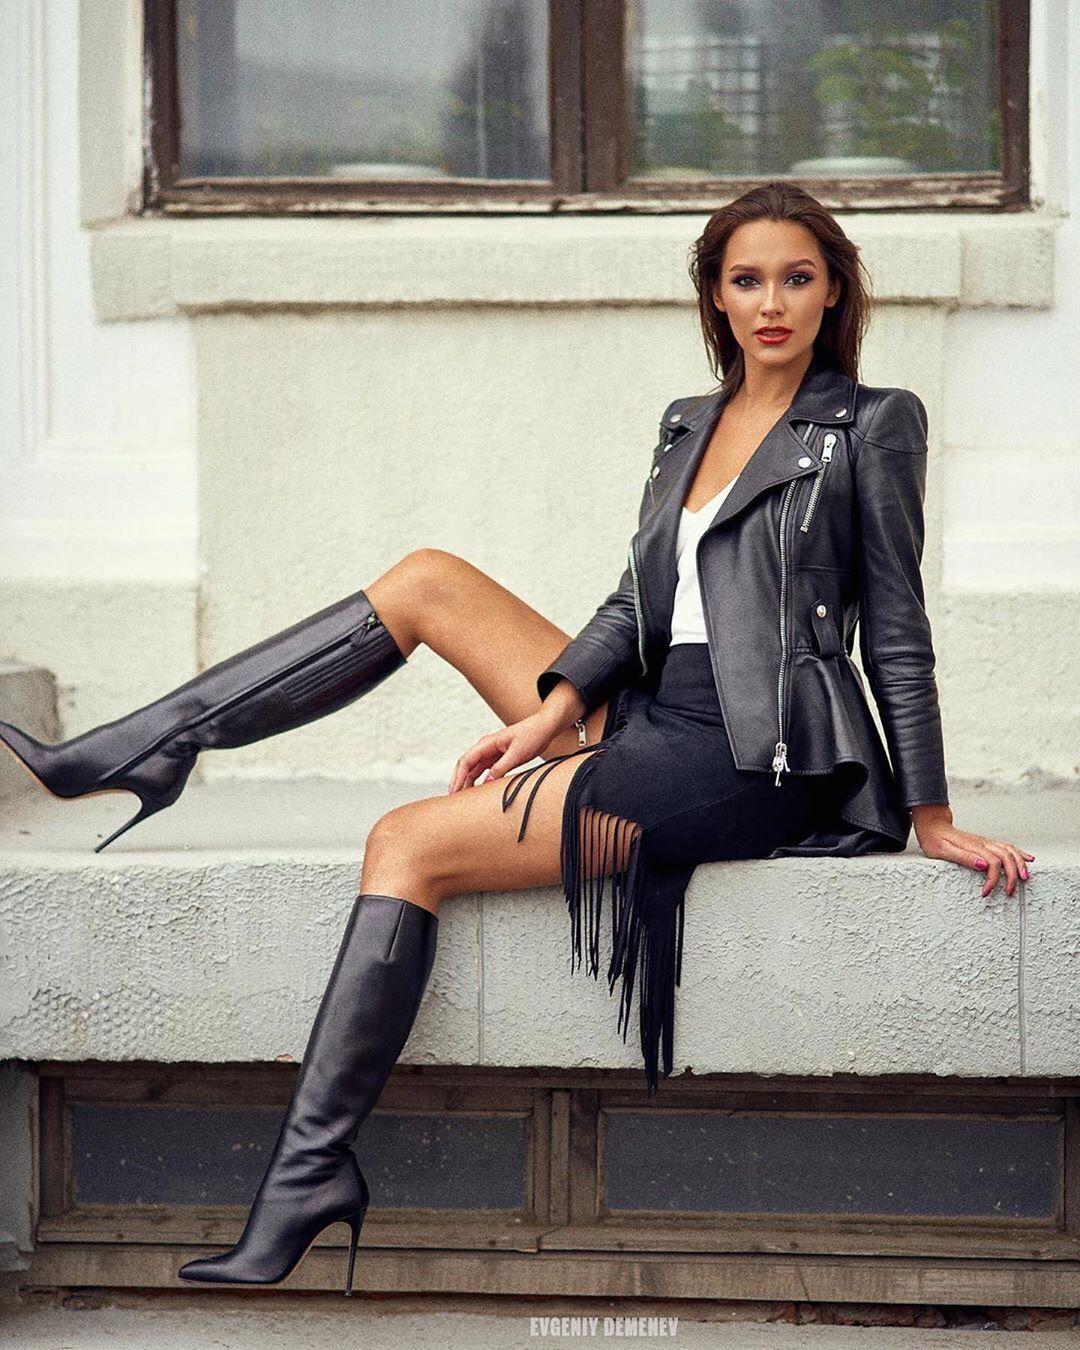 John on Instagram: @mila_sh_11 • • #leather #leatherboots